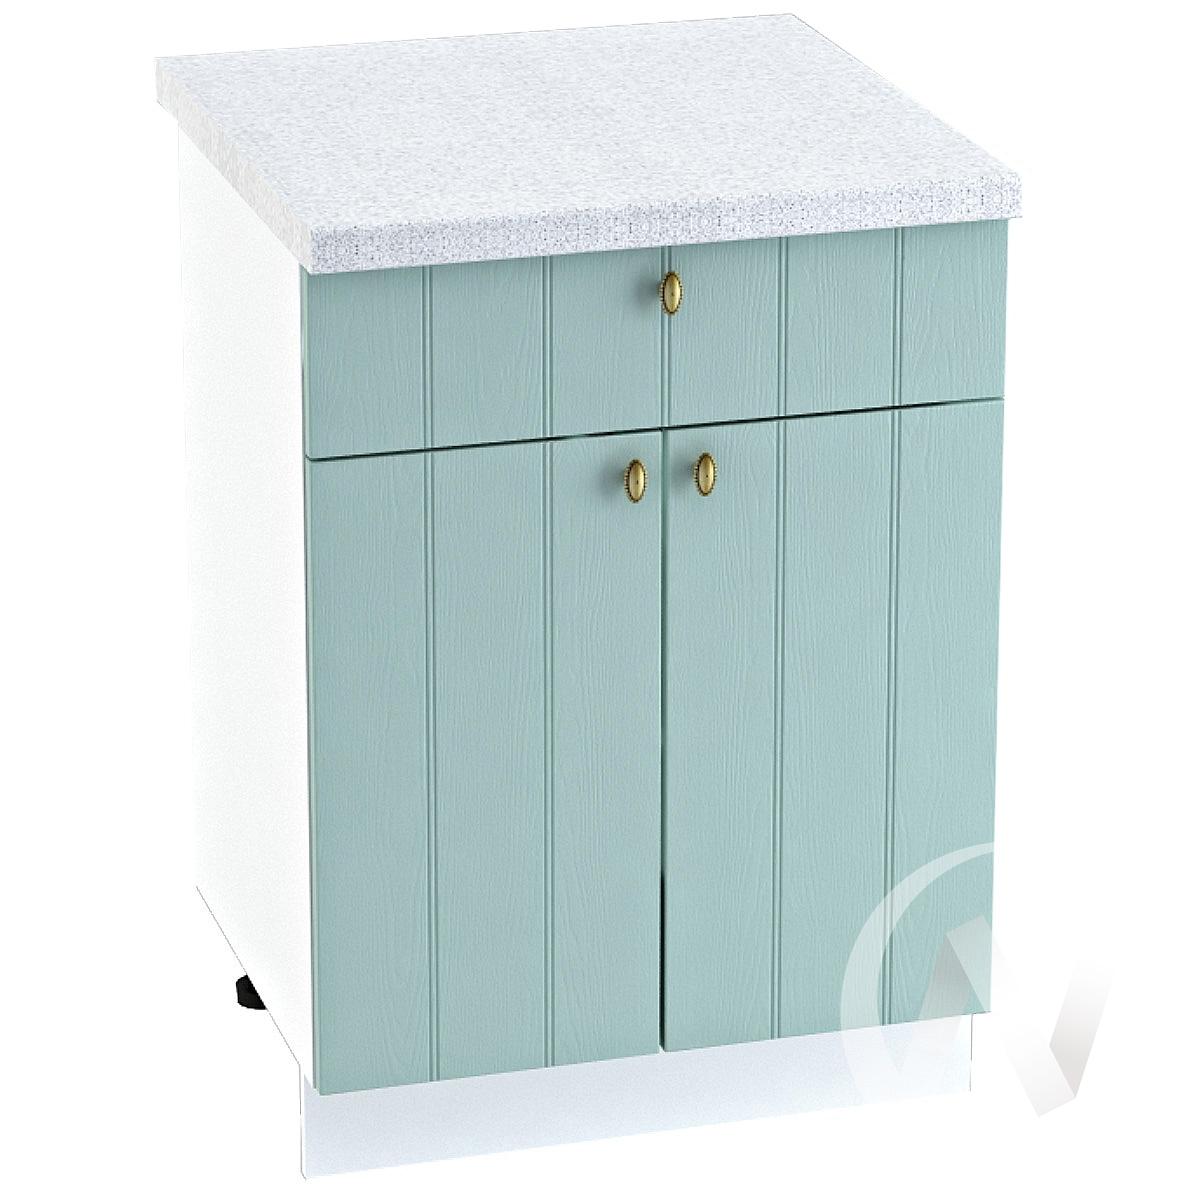 "Кухня ""Прованс"": Шкаф нижний с ящиком 600, ШН1Я 600 М (голубой/корпус белый)"